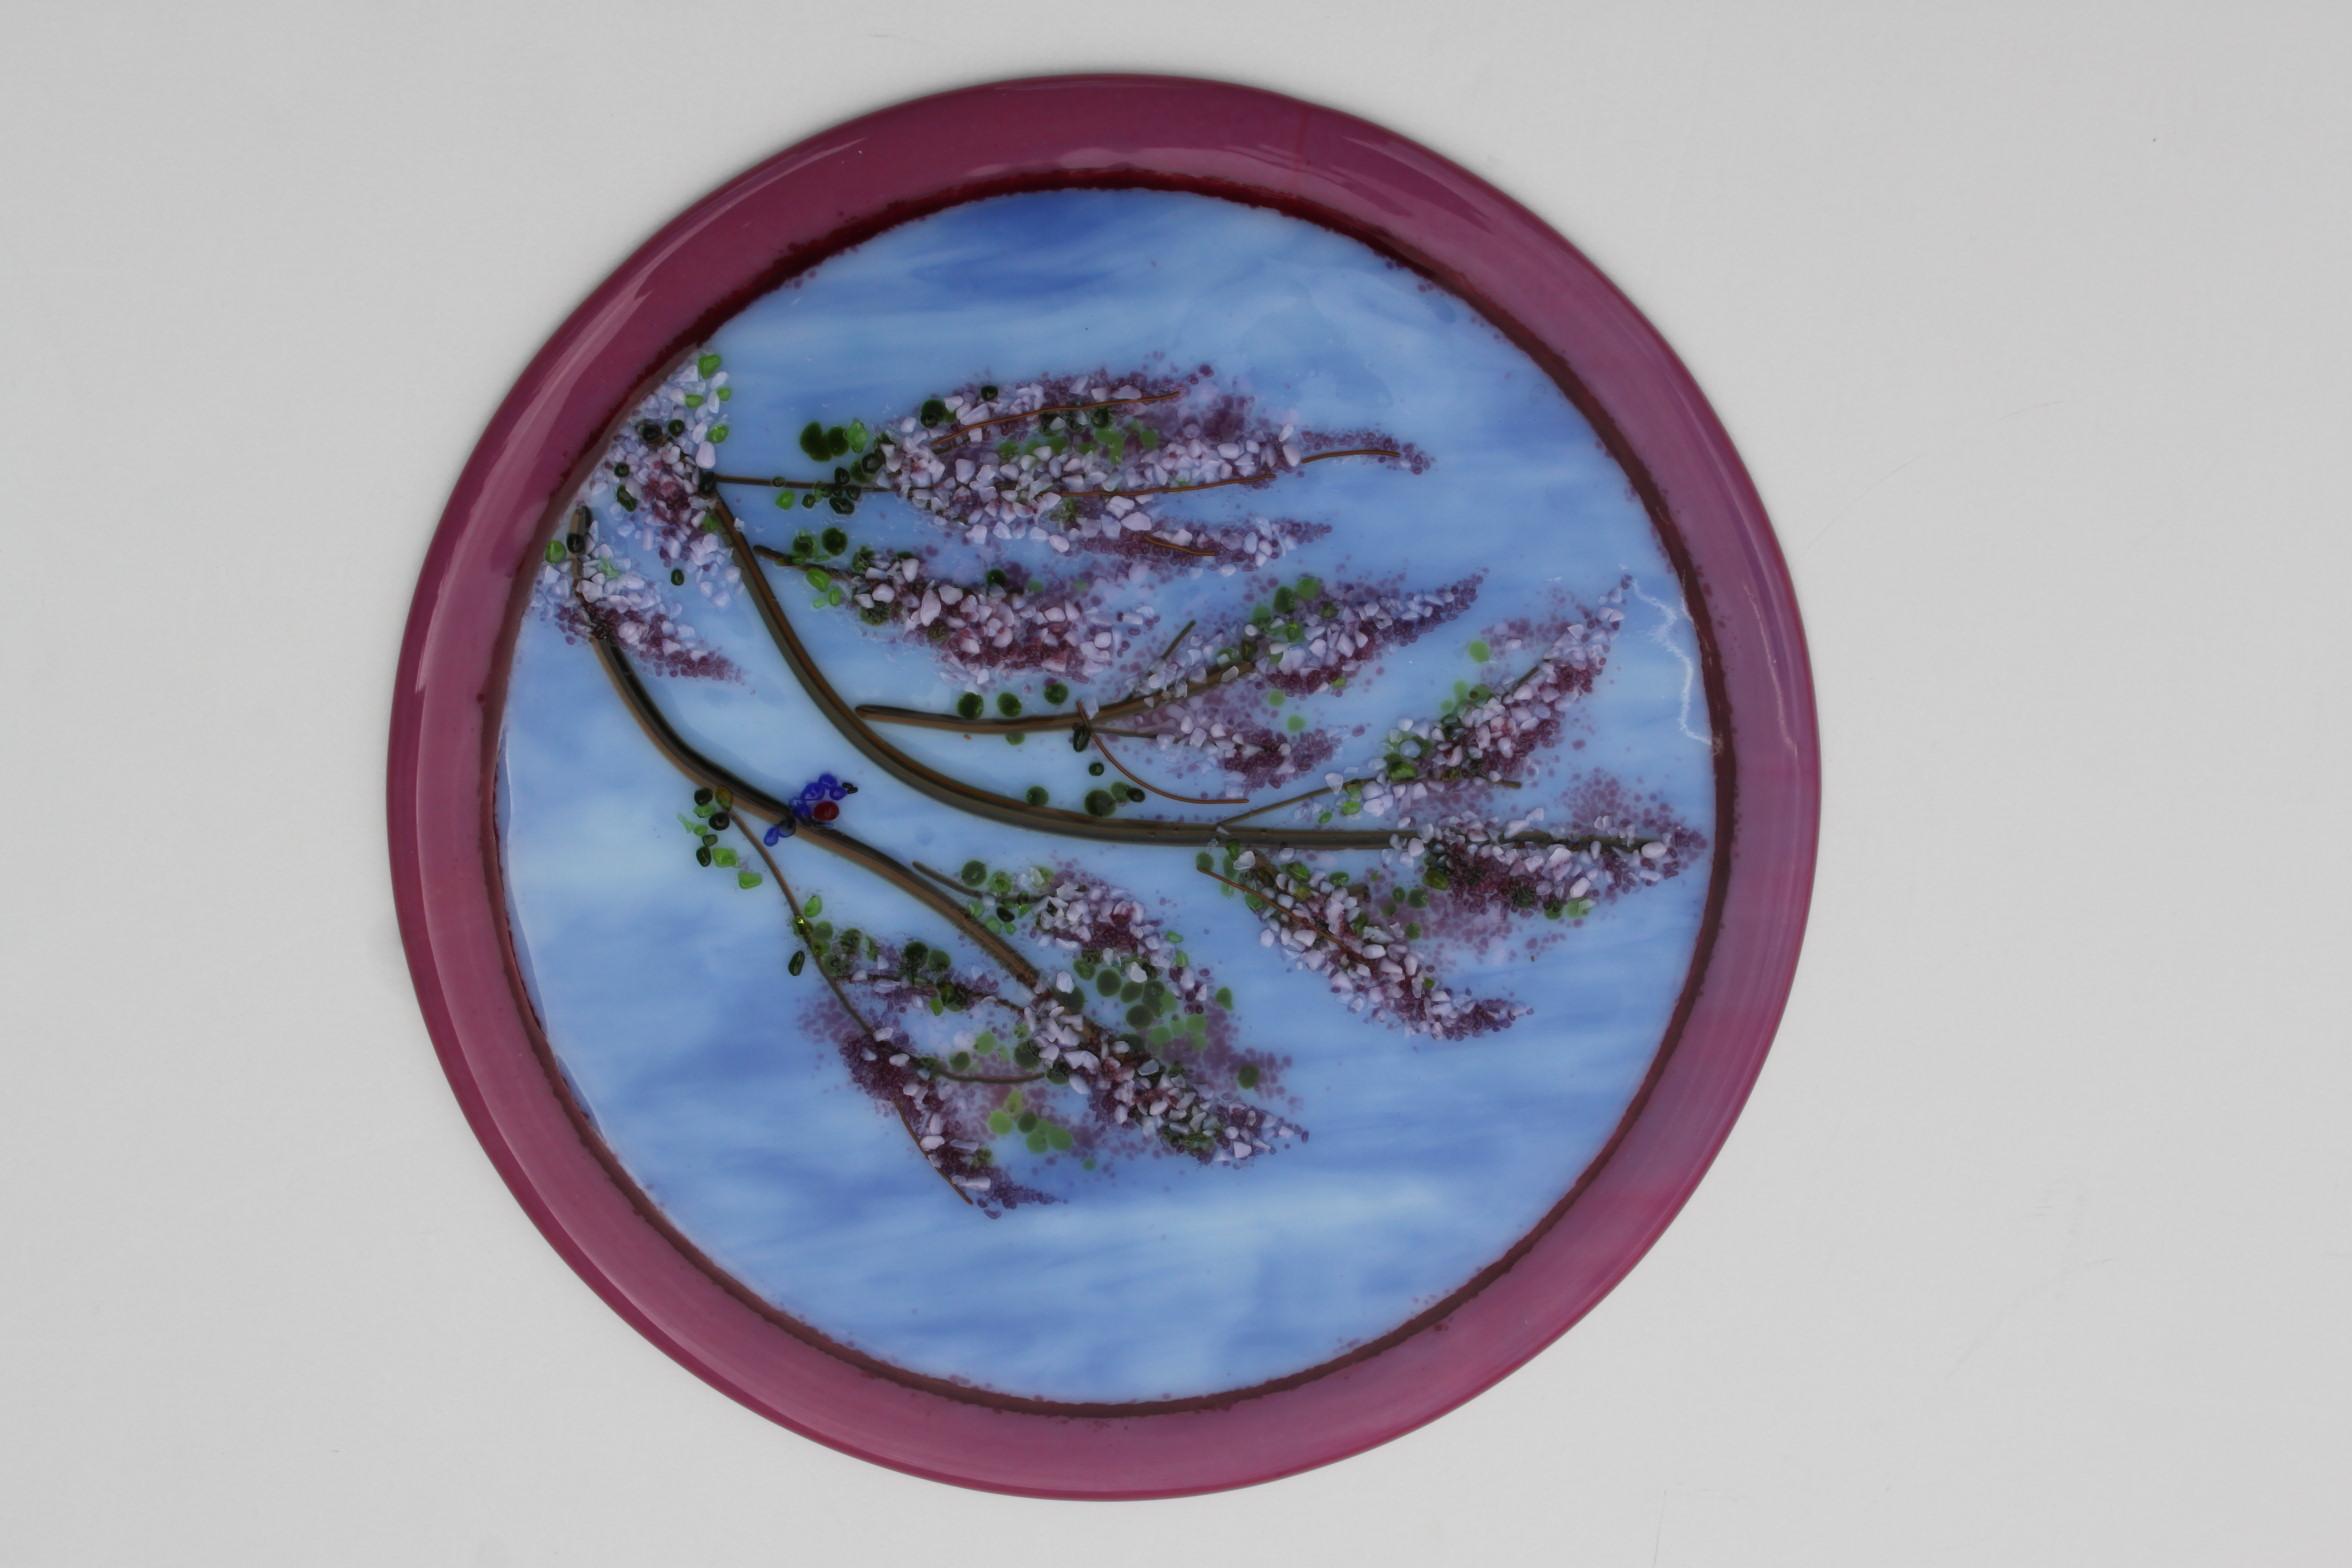 Erica cherry blossom plate OK.JPG